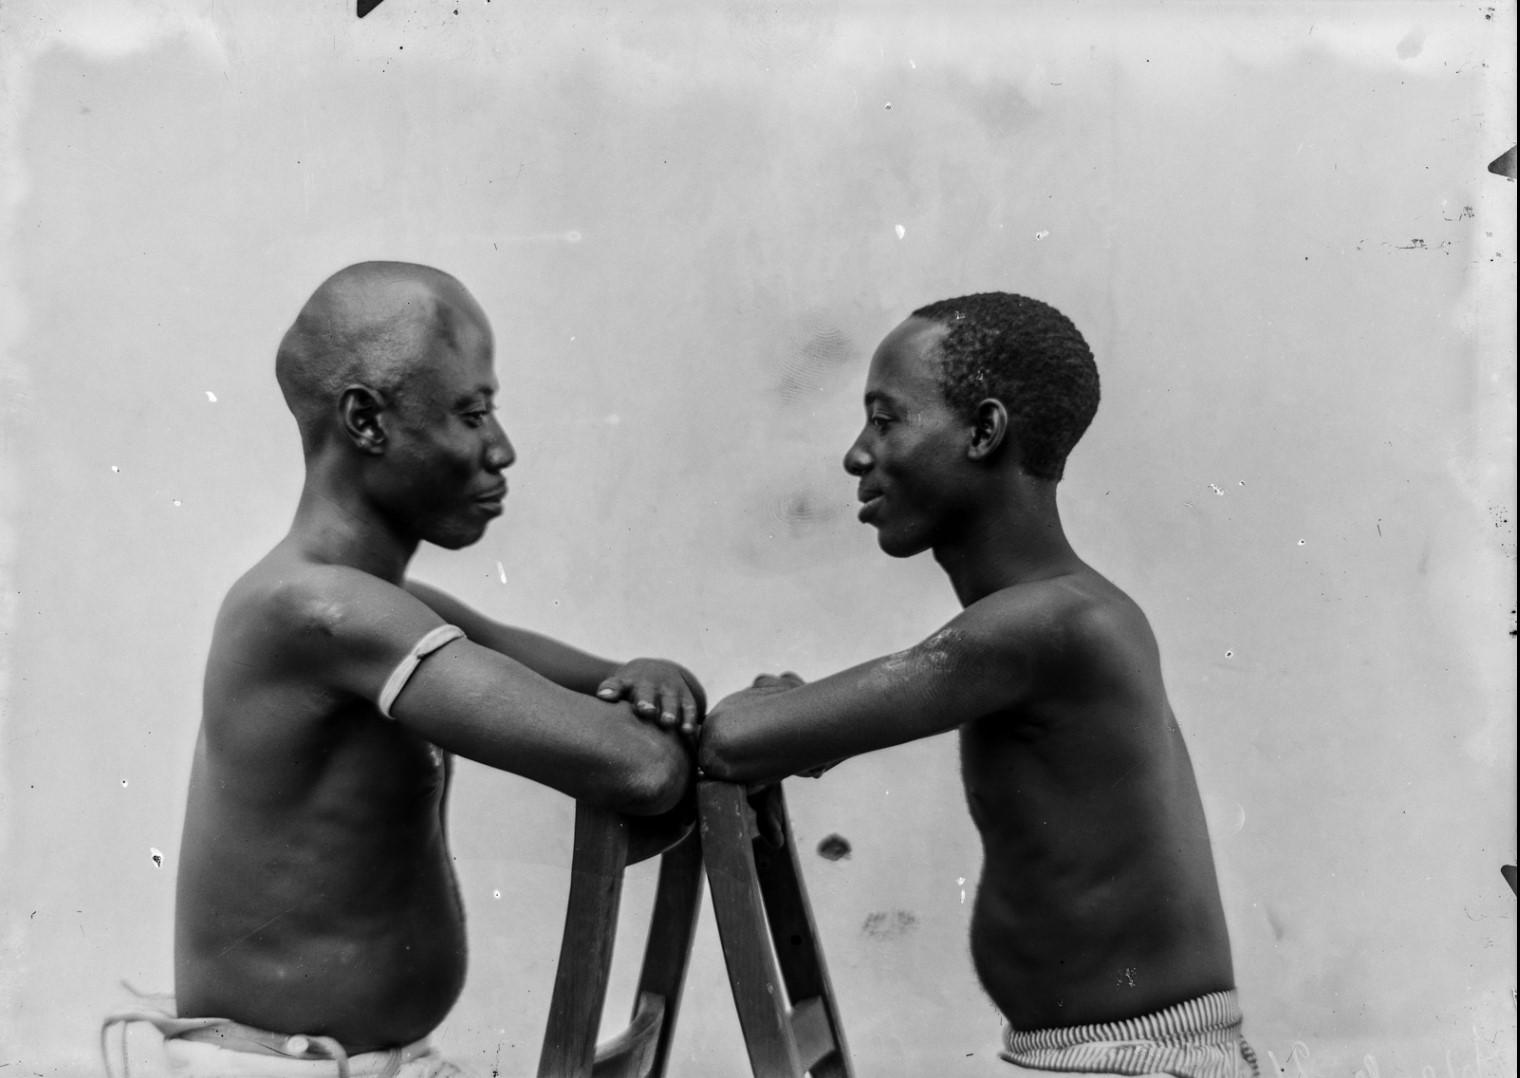 90. Портрет двух мужчин